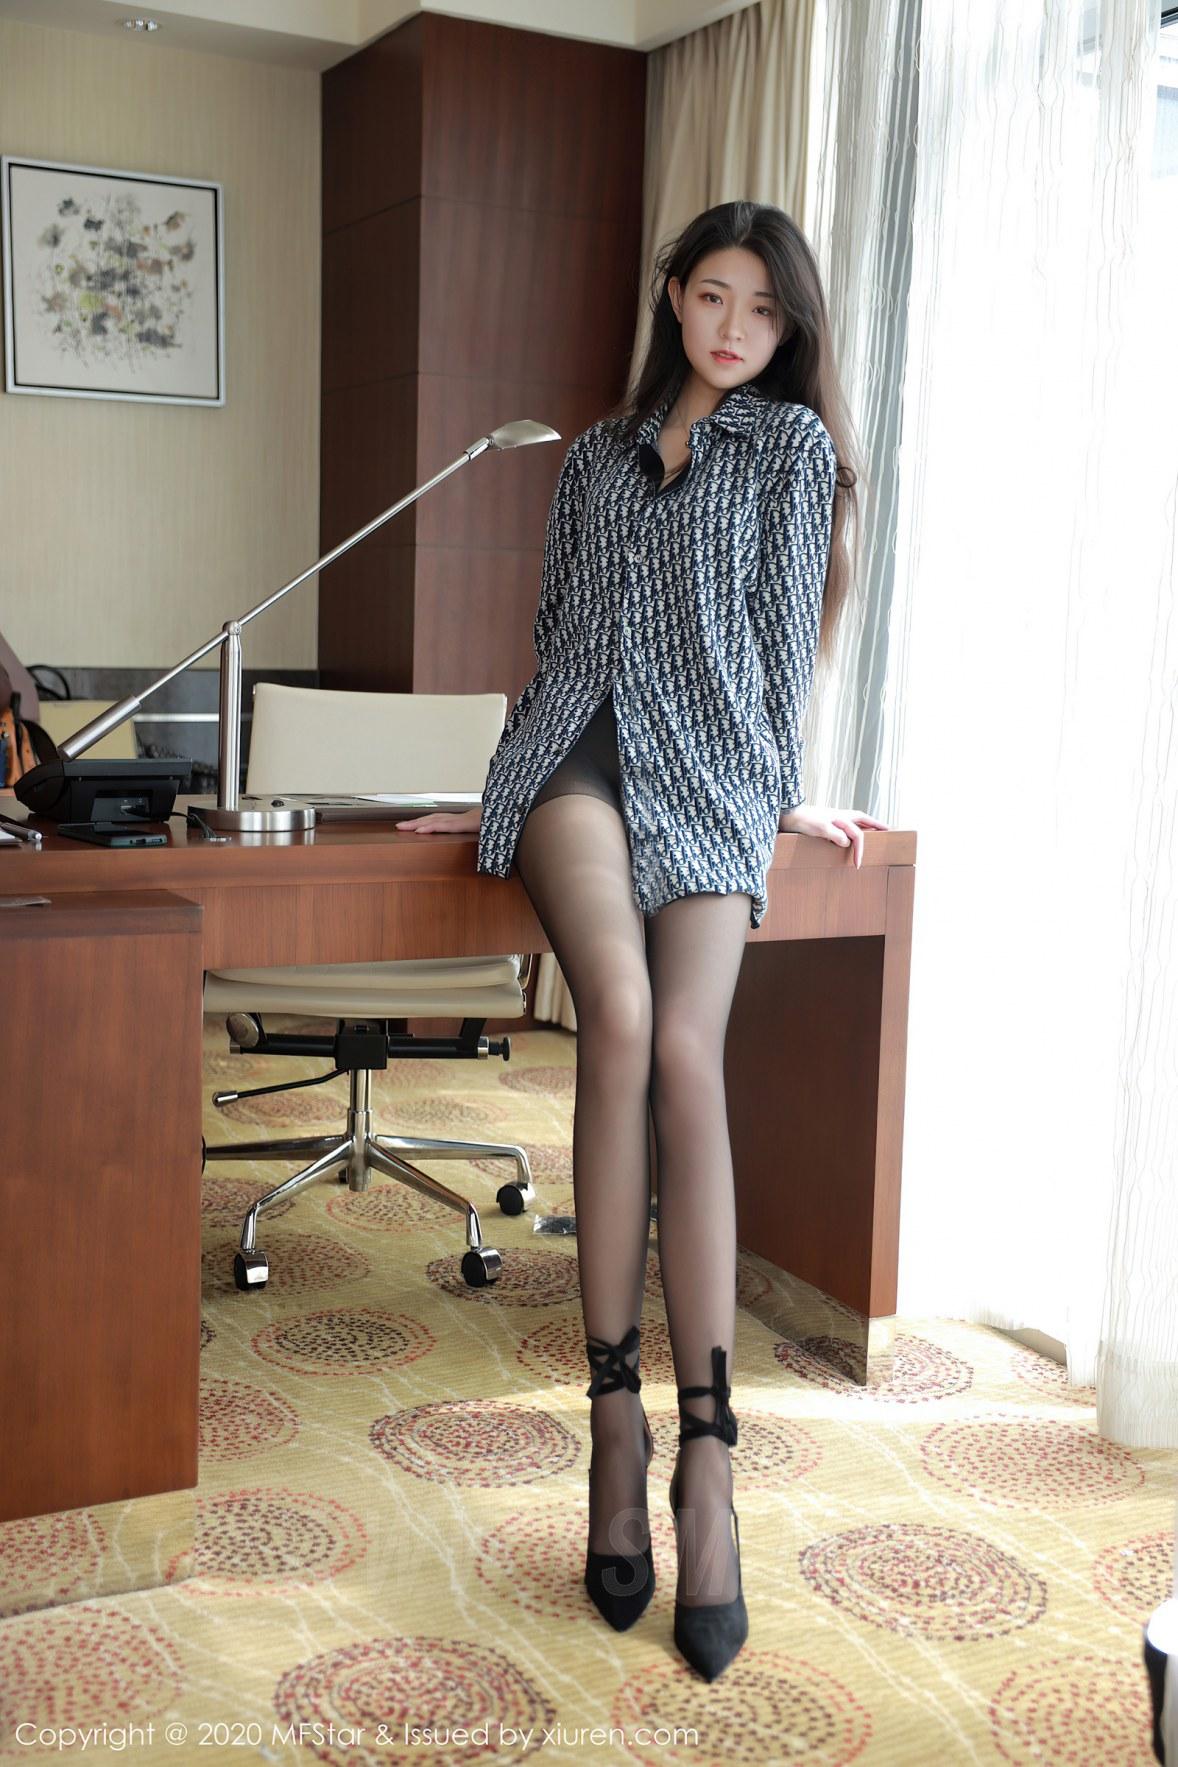 MFStar 模范学院 Vol.374  格子衬衫与黑丝细腿 苏雨彤 - 1